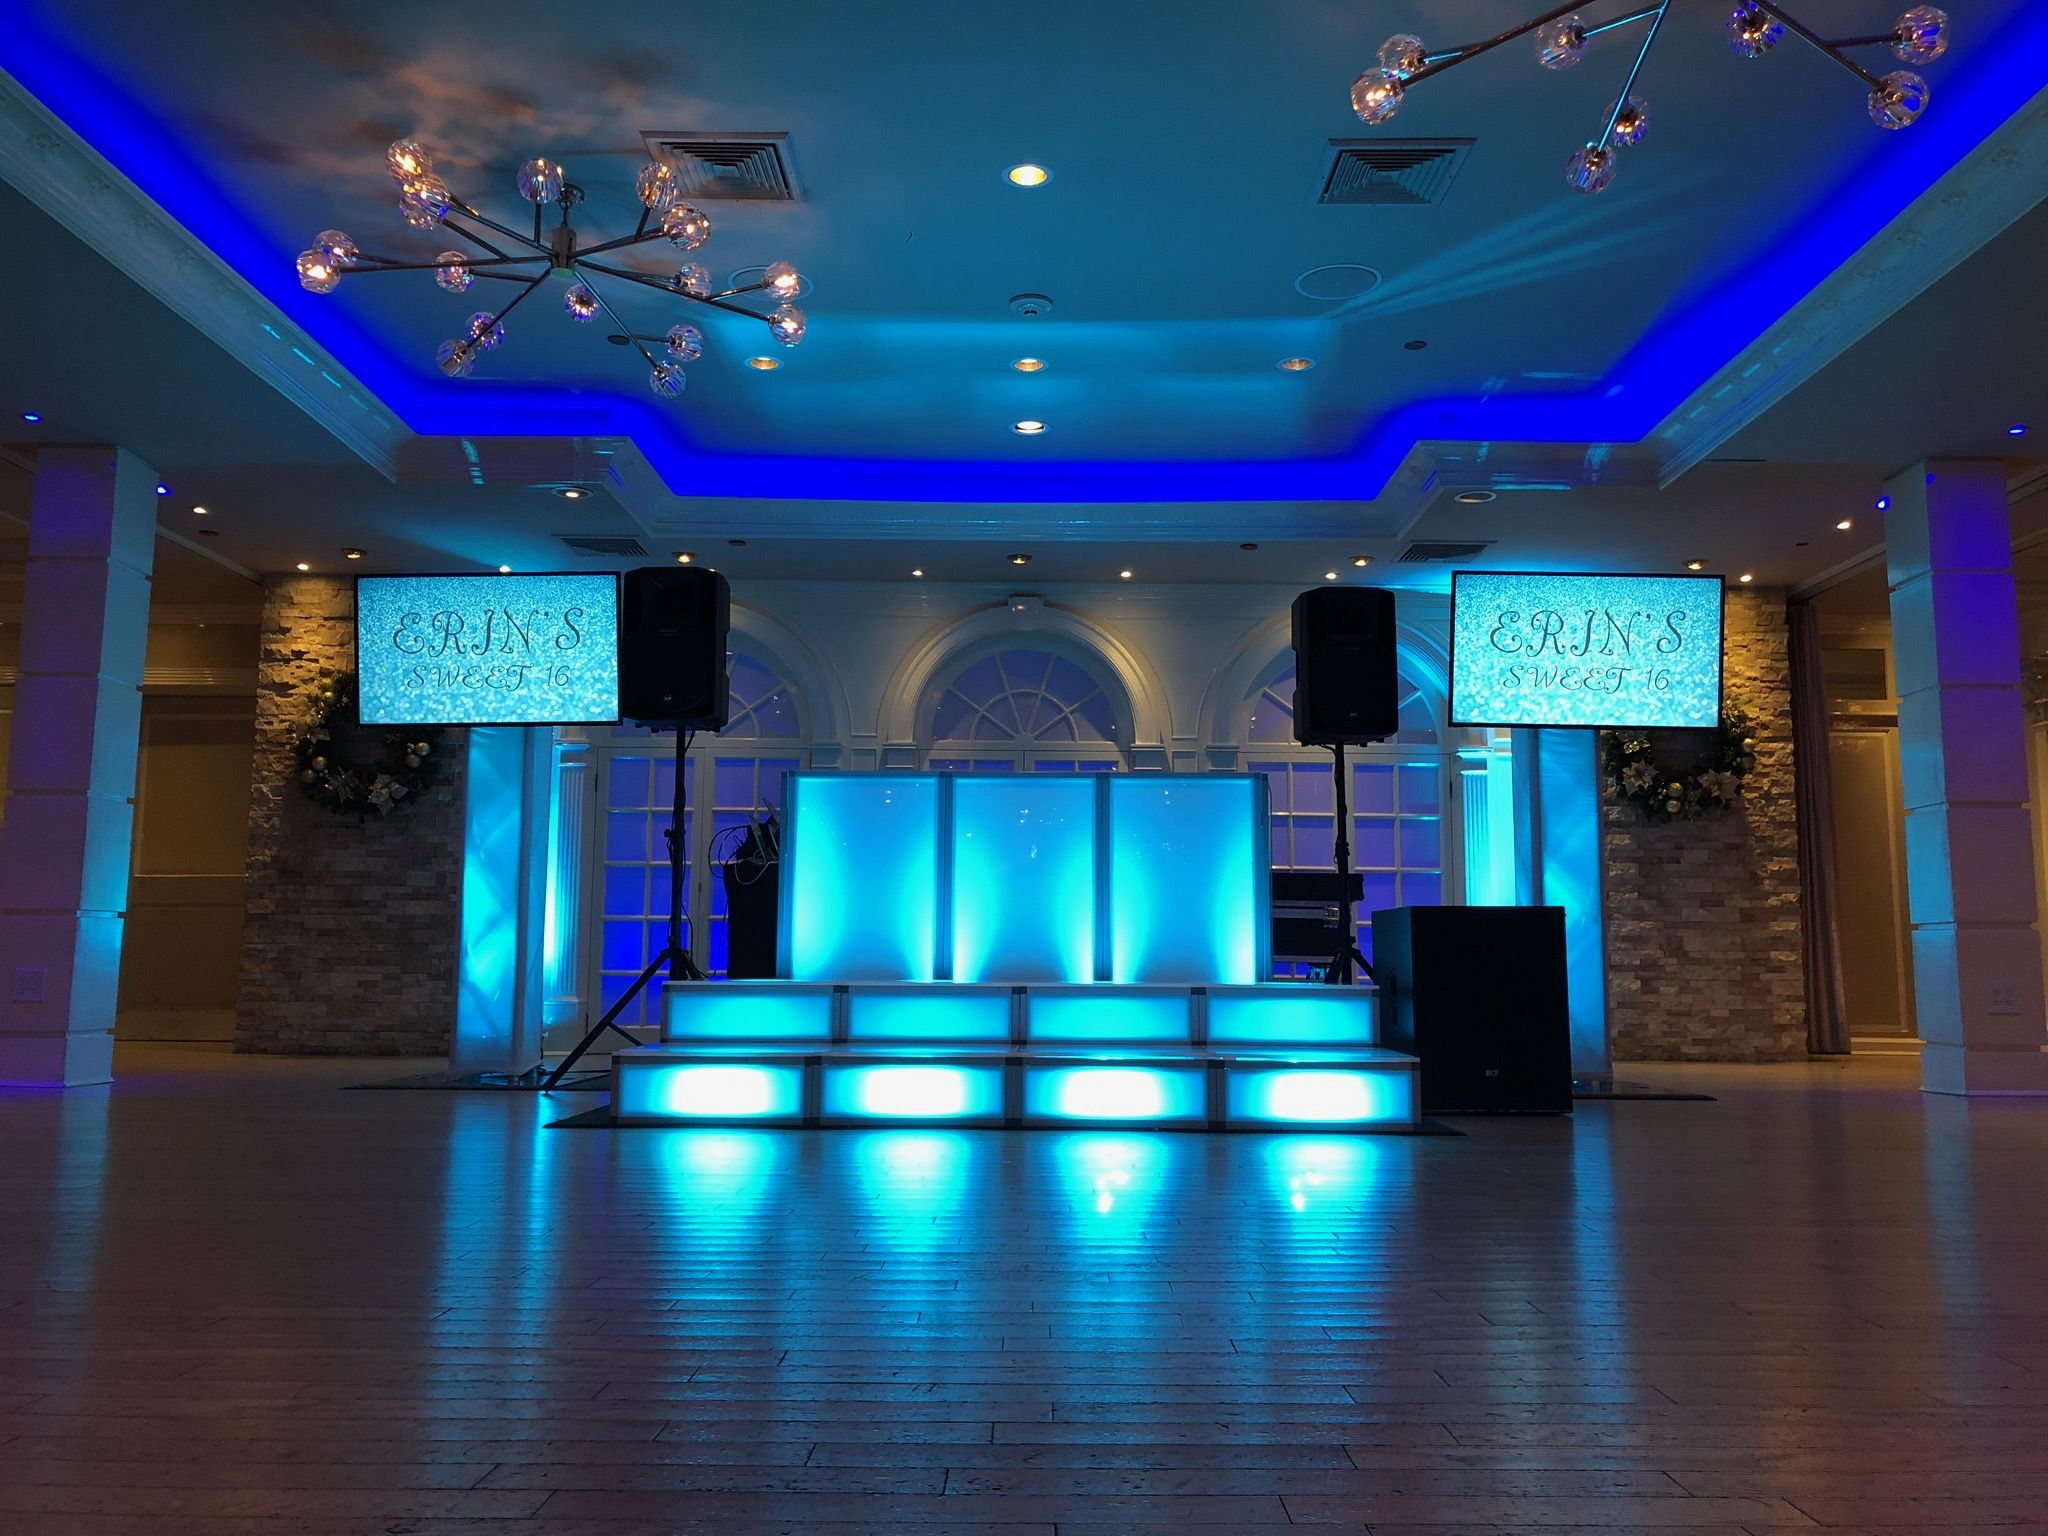 Sweet 16 Dj Long Island Led Stages Event Event Lighting Wedding Rentals